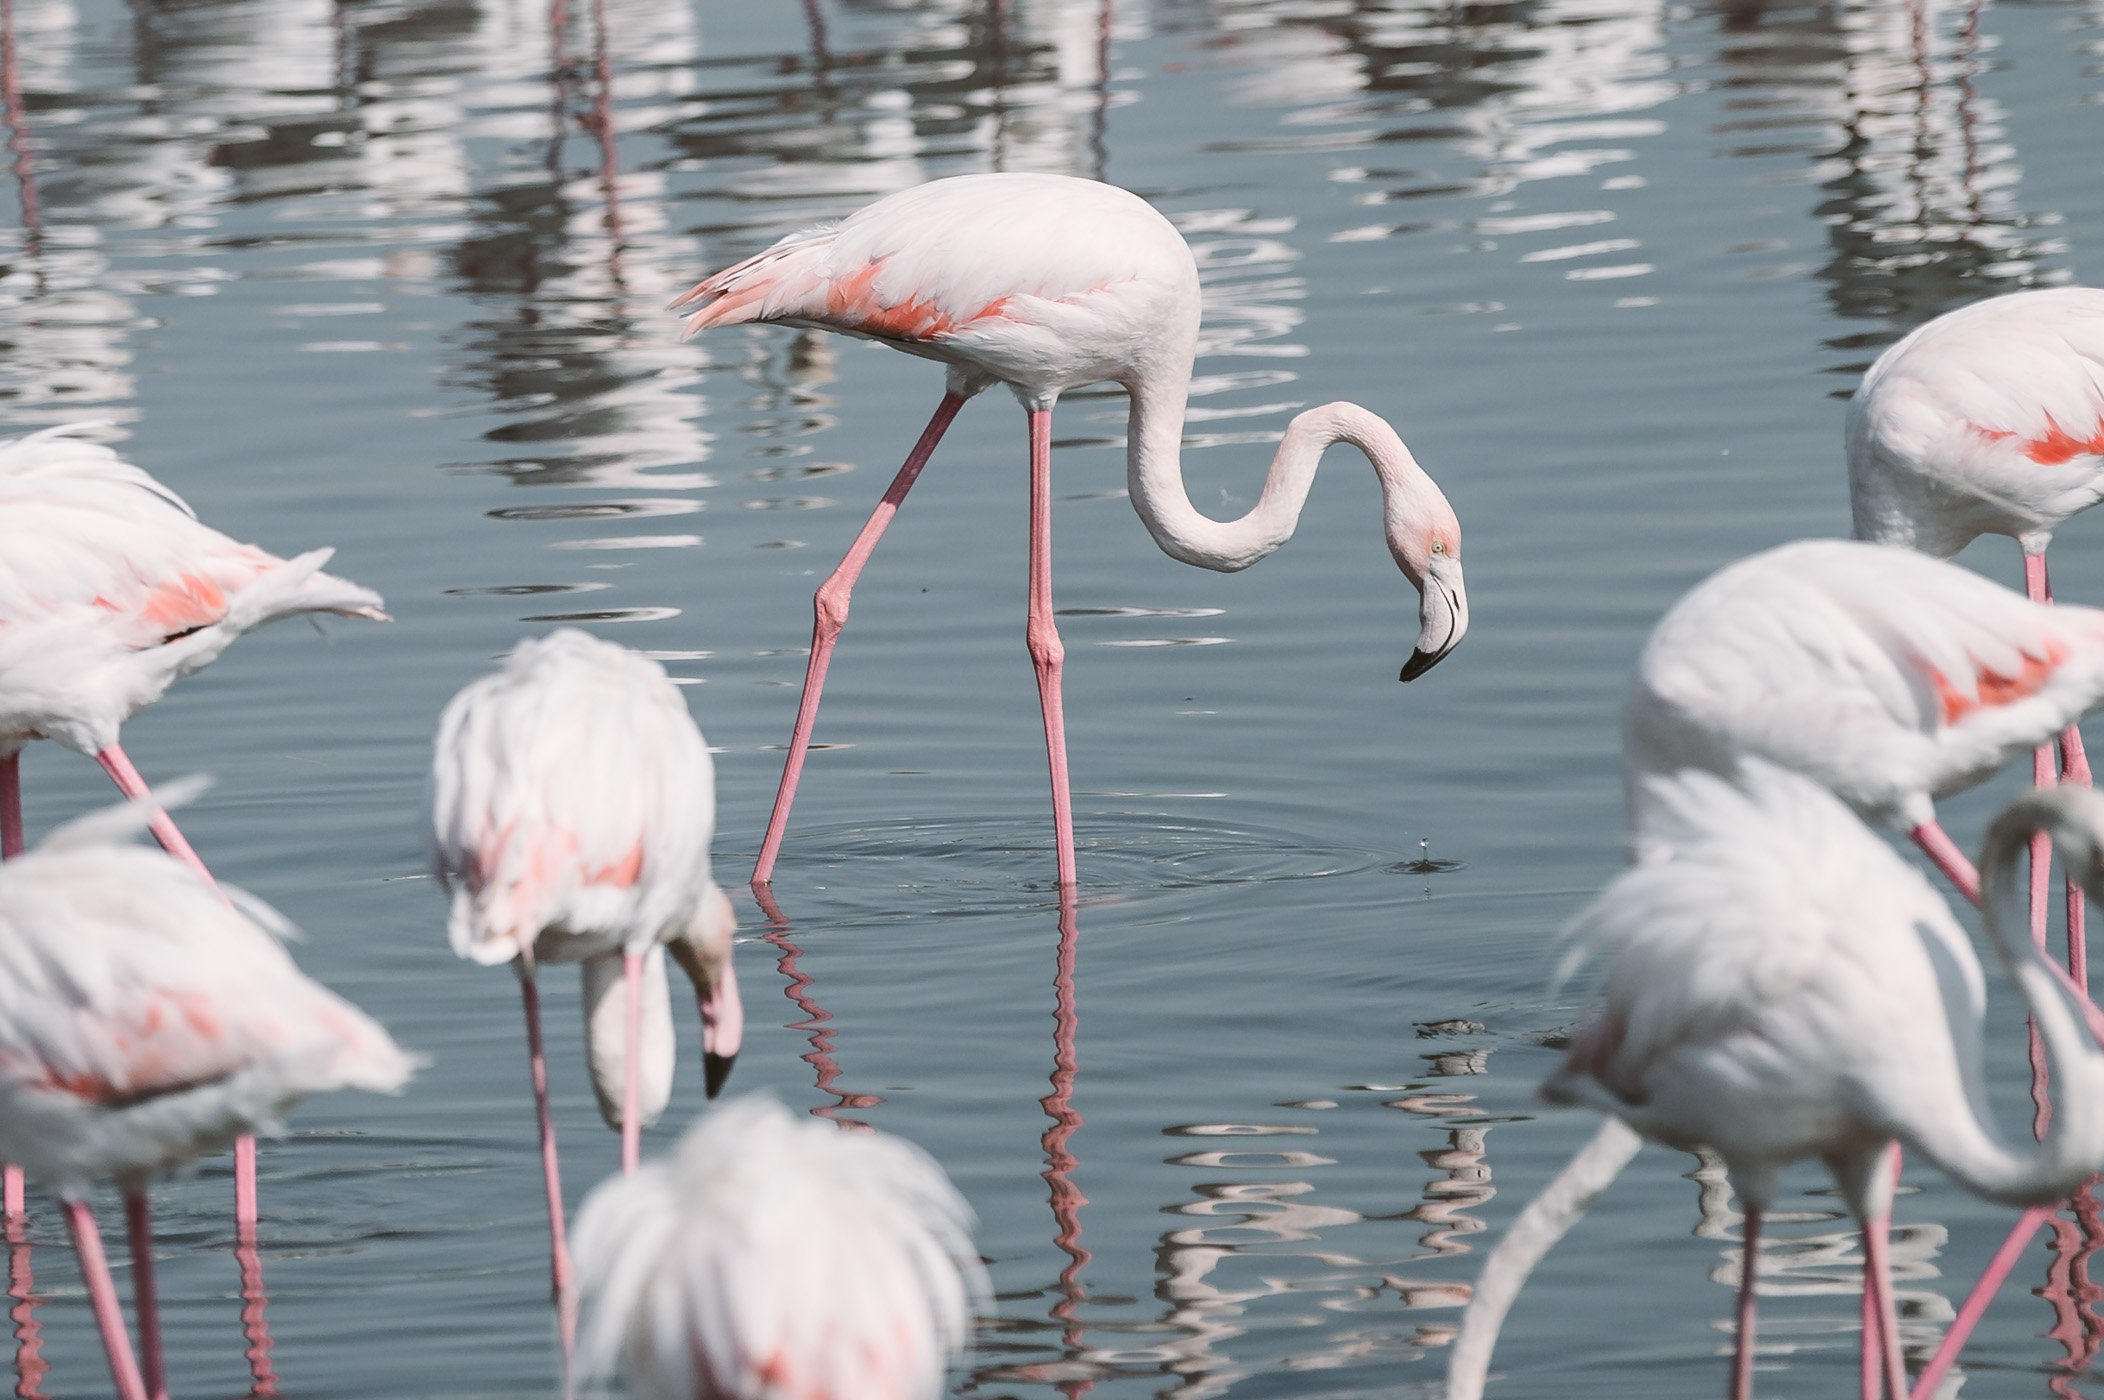 Flamingos at Ras Al Khor wildlife sanctuary Dubai